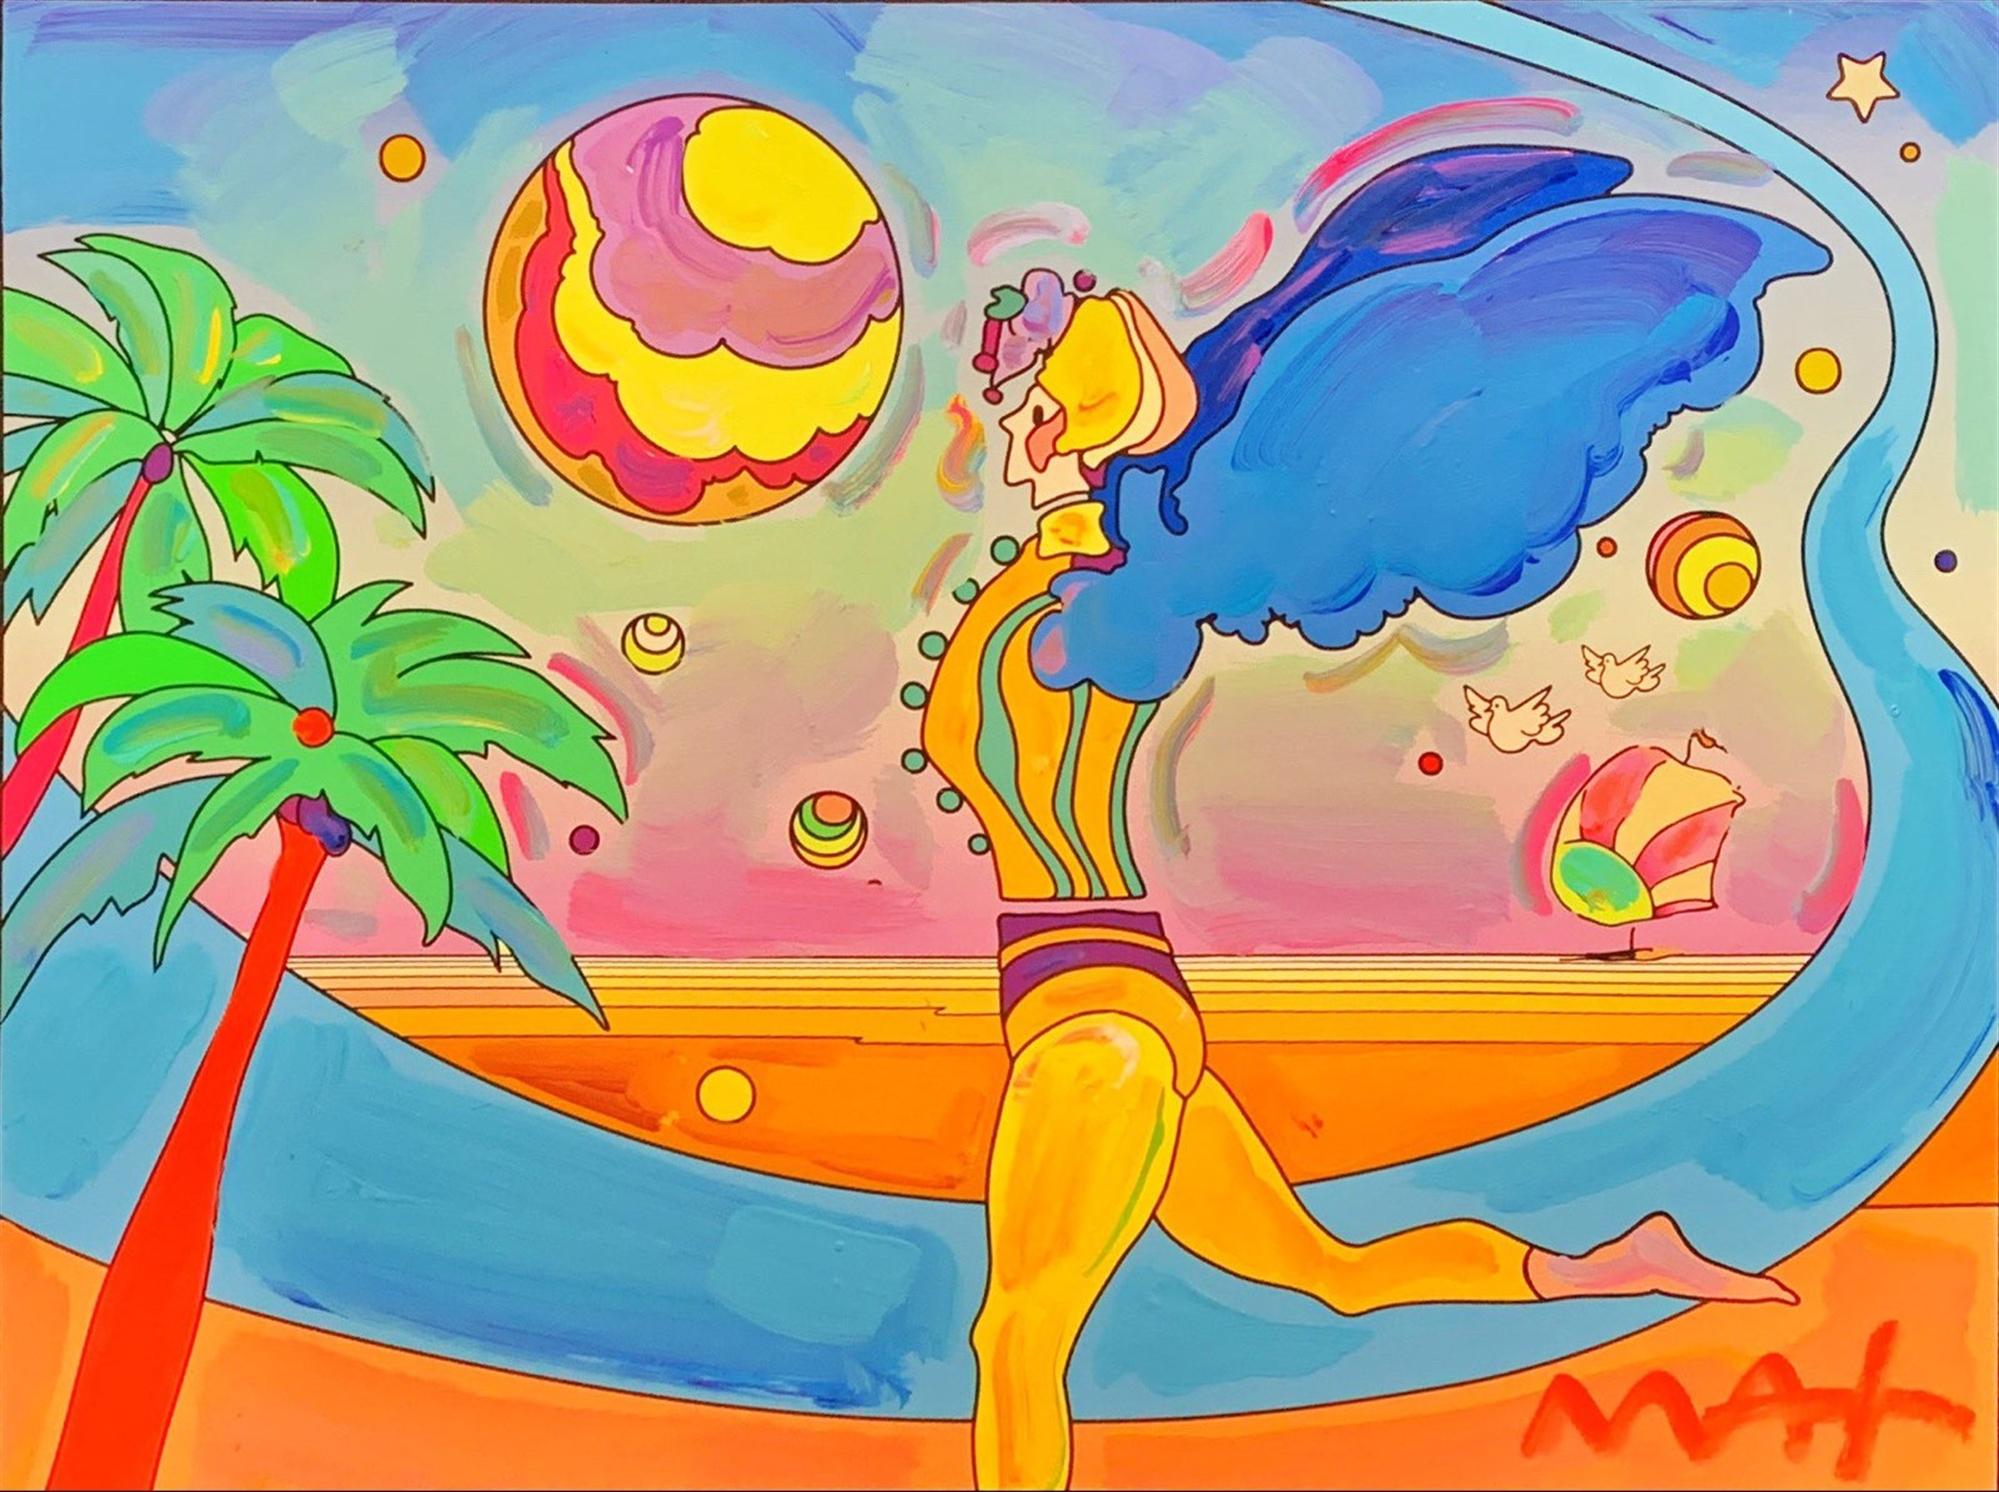 Cosmic Series: Planetarian Traveler by Peter Max